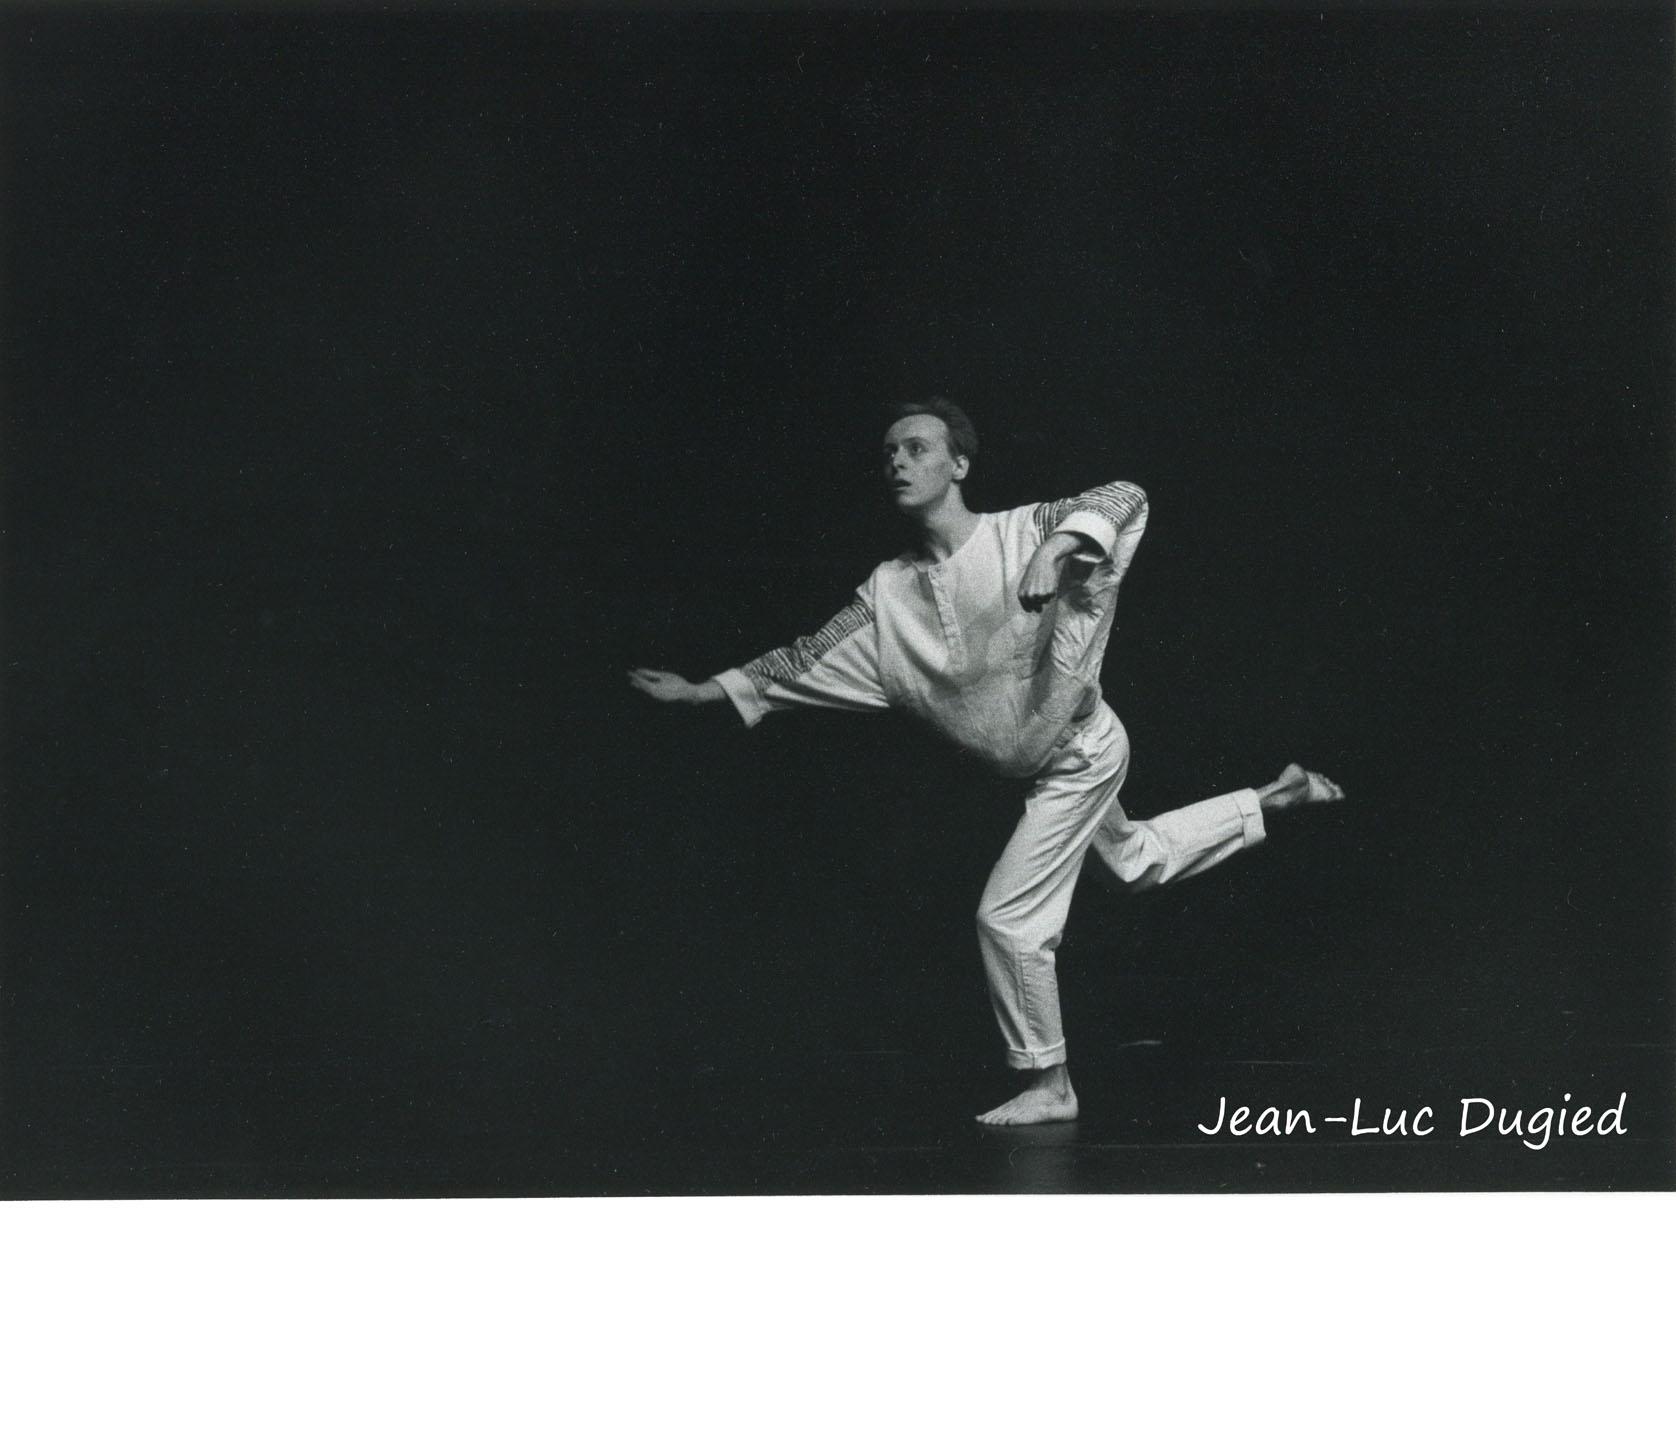 11 Dugied Fabrice - la valse - 1985